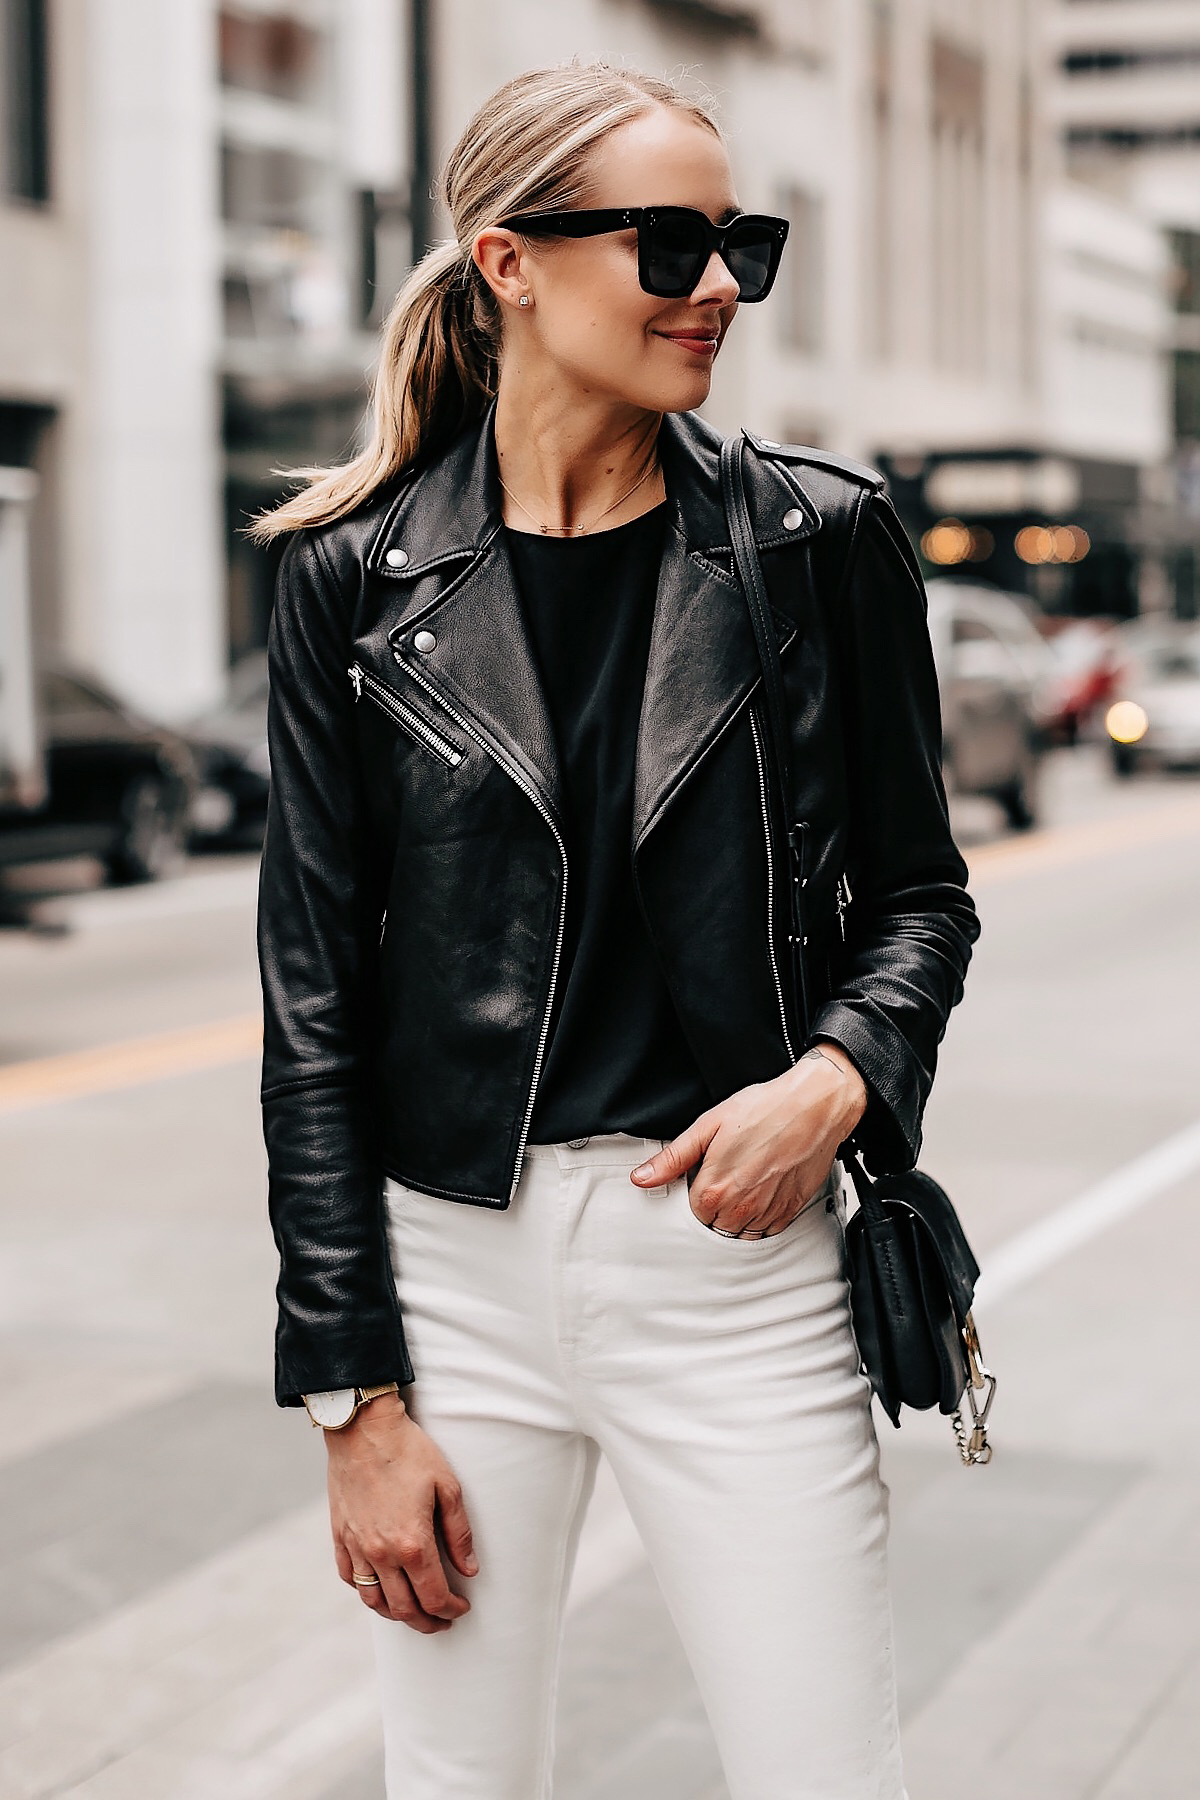 Blonde Woman Wearing Black Leather Jacket Black Top White Cropped Jeans Chloe Faye Black Handbag Fashion Jackson San Diego Fashion Blogger Street Style